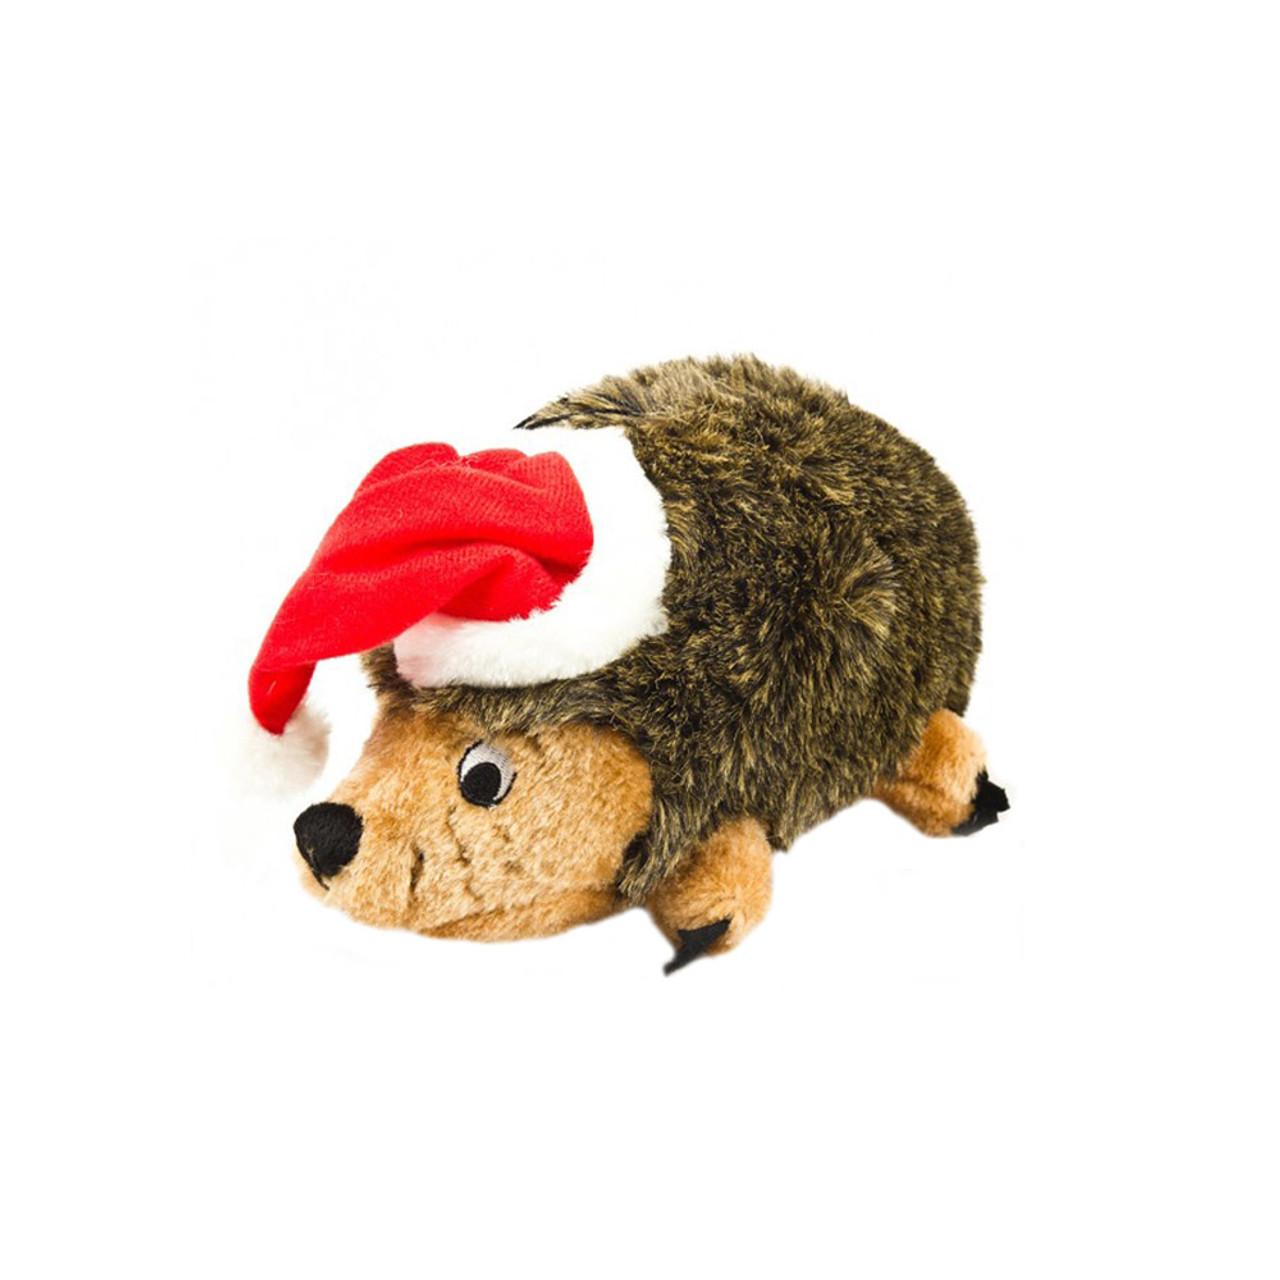 Outward Hound Holiday Hedgehogz Plush Dog Toy